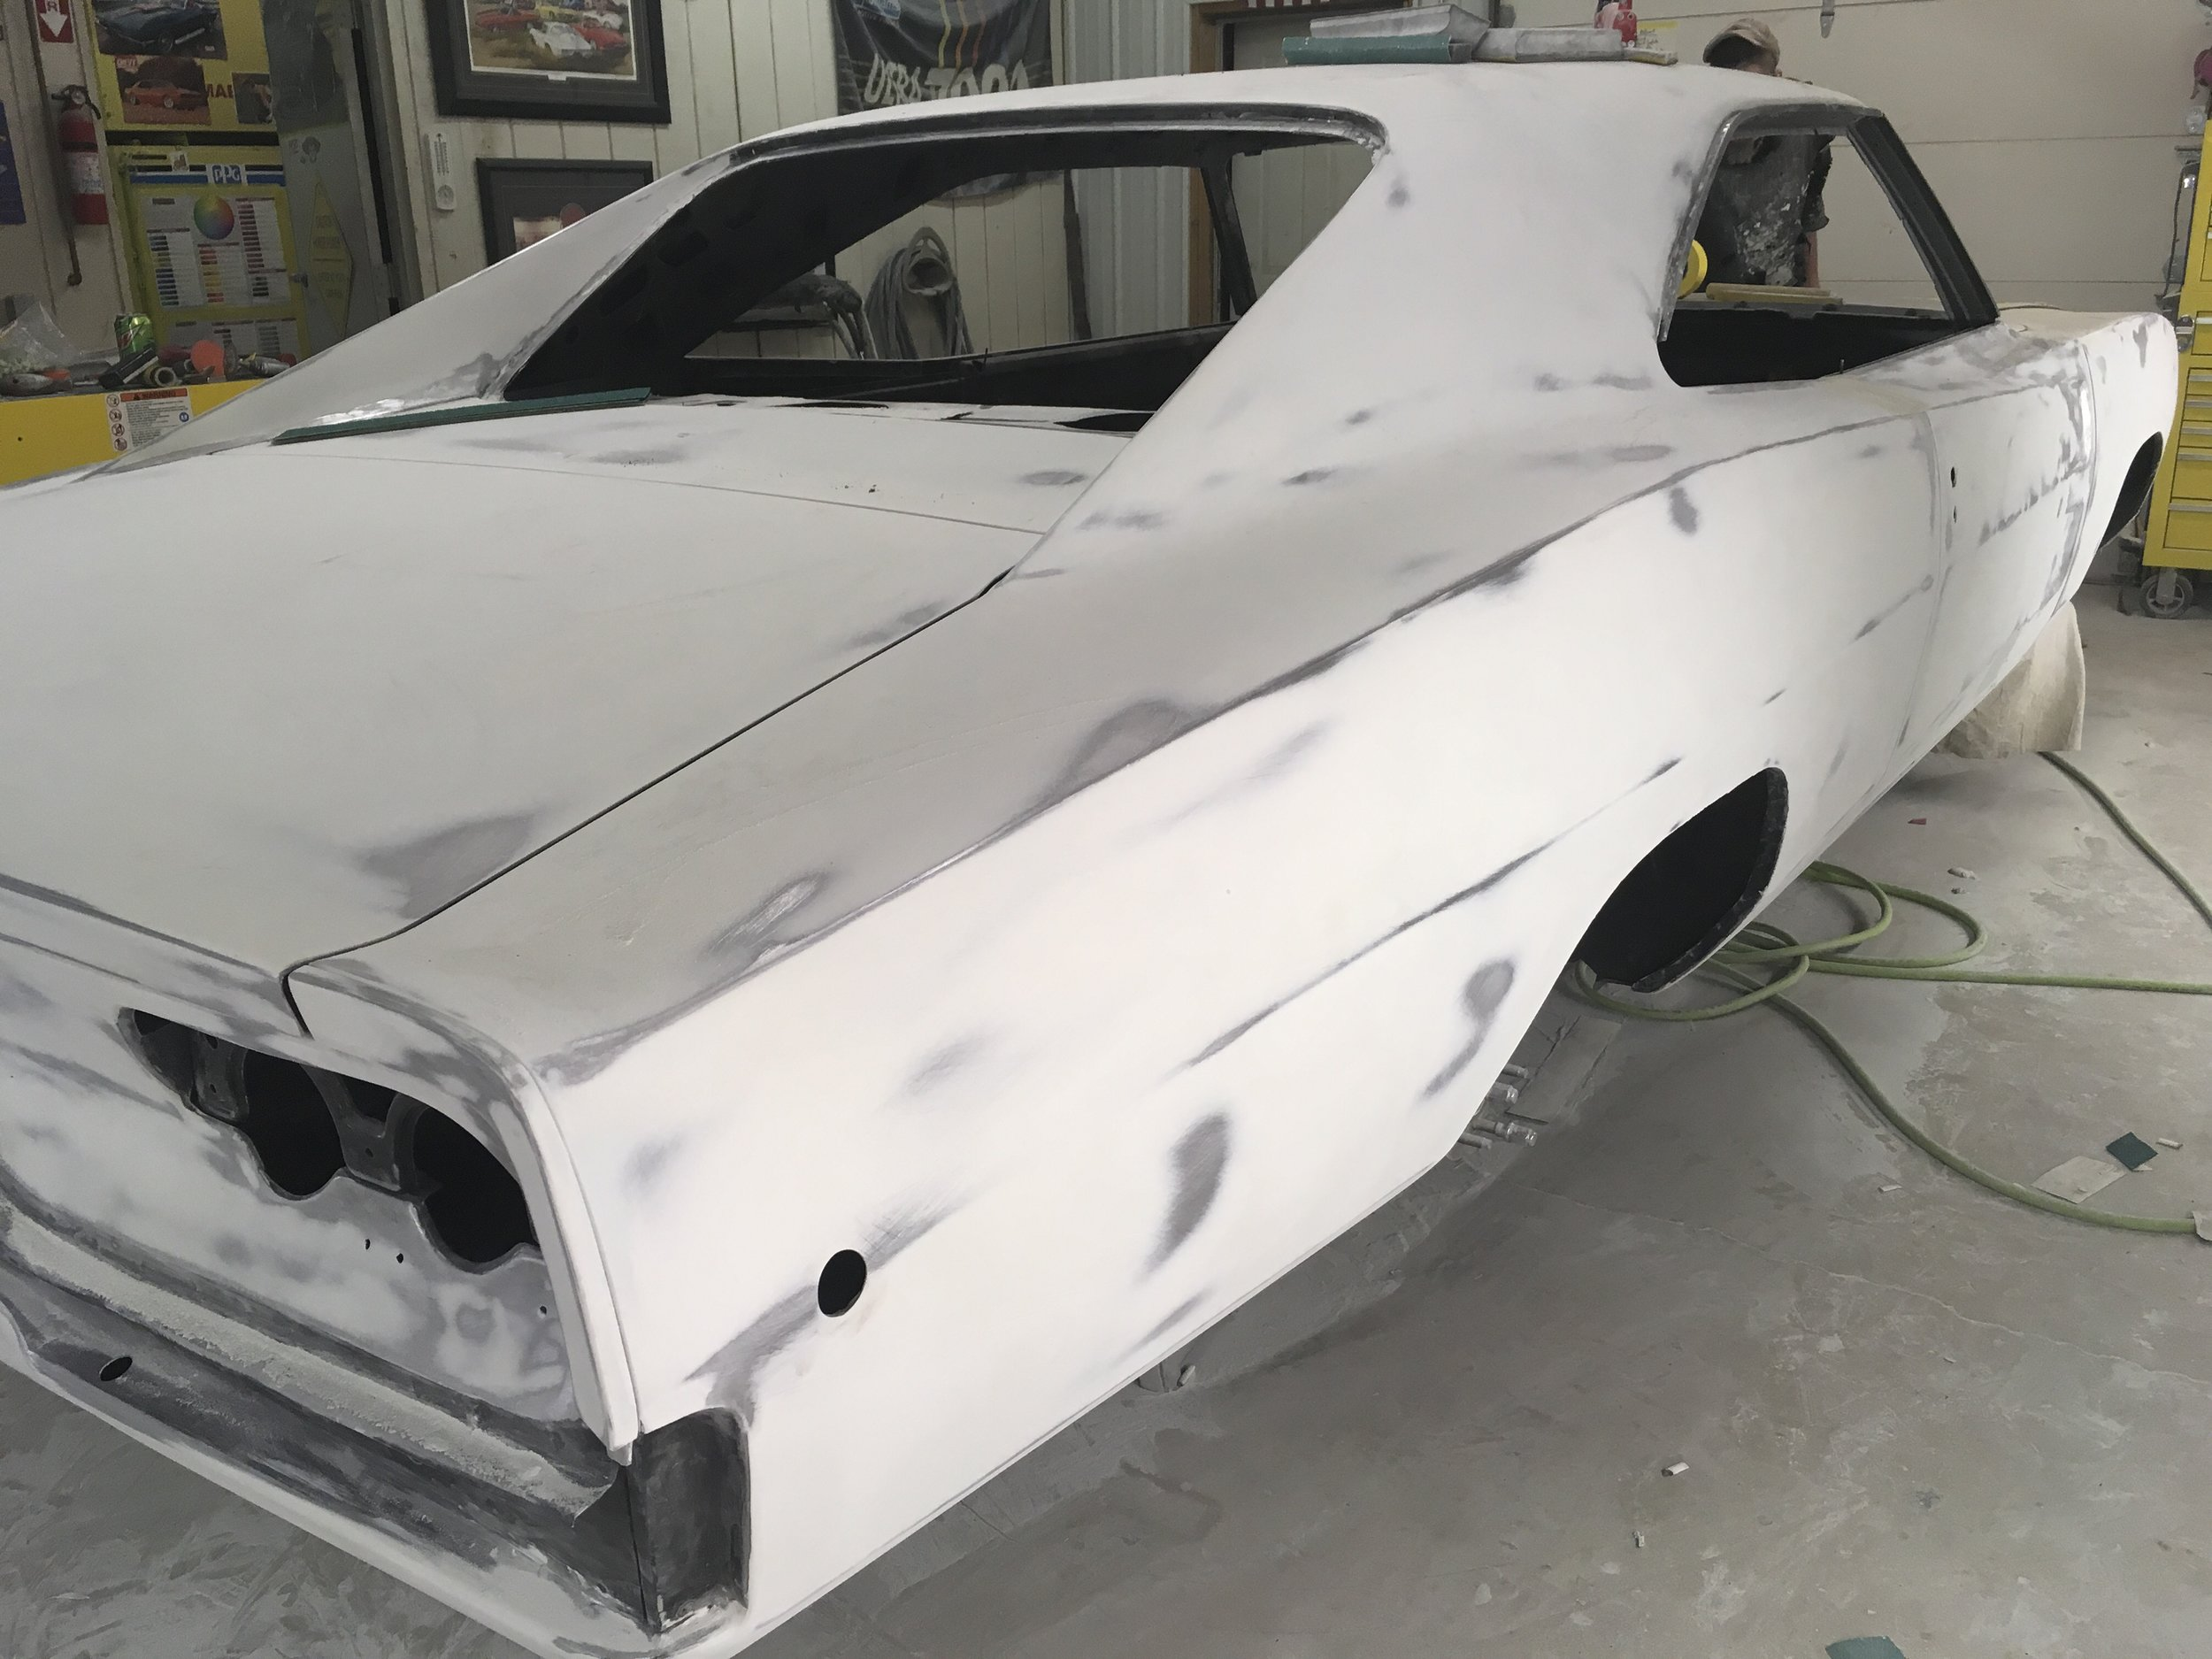 1968-Hell-Cat-Charger-minneapolis-hot-rod-custom-build-restoration-15.jpg